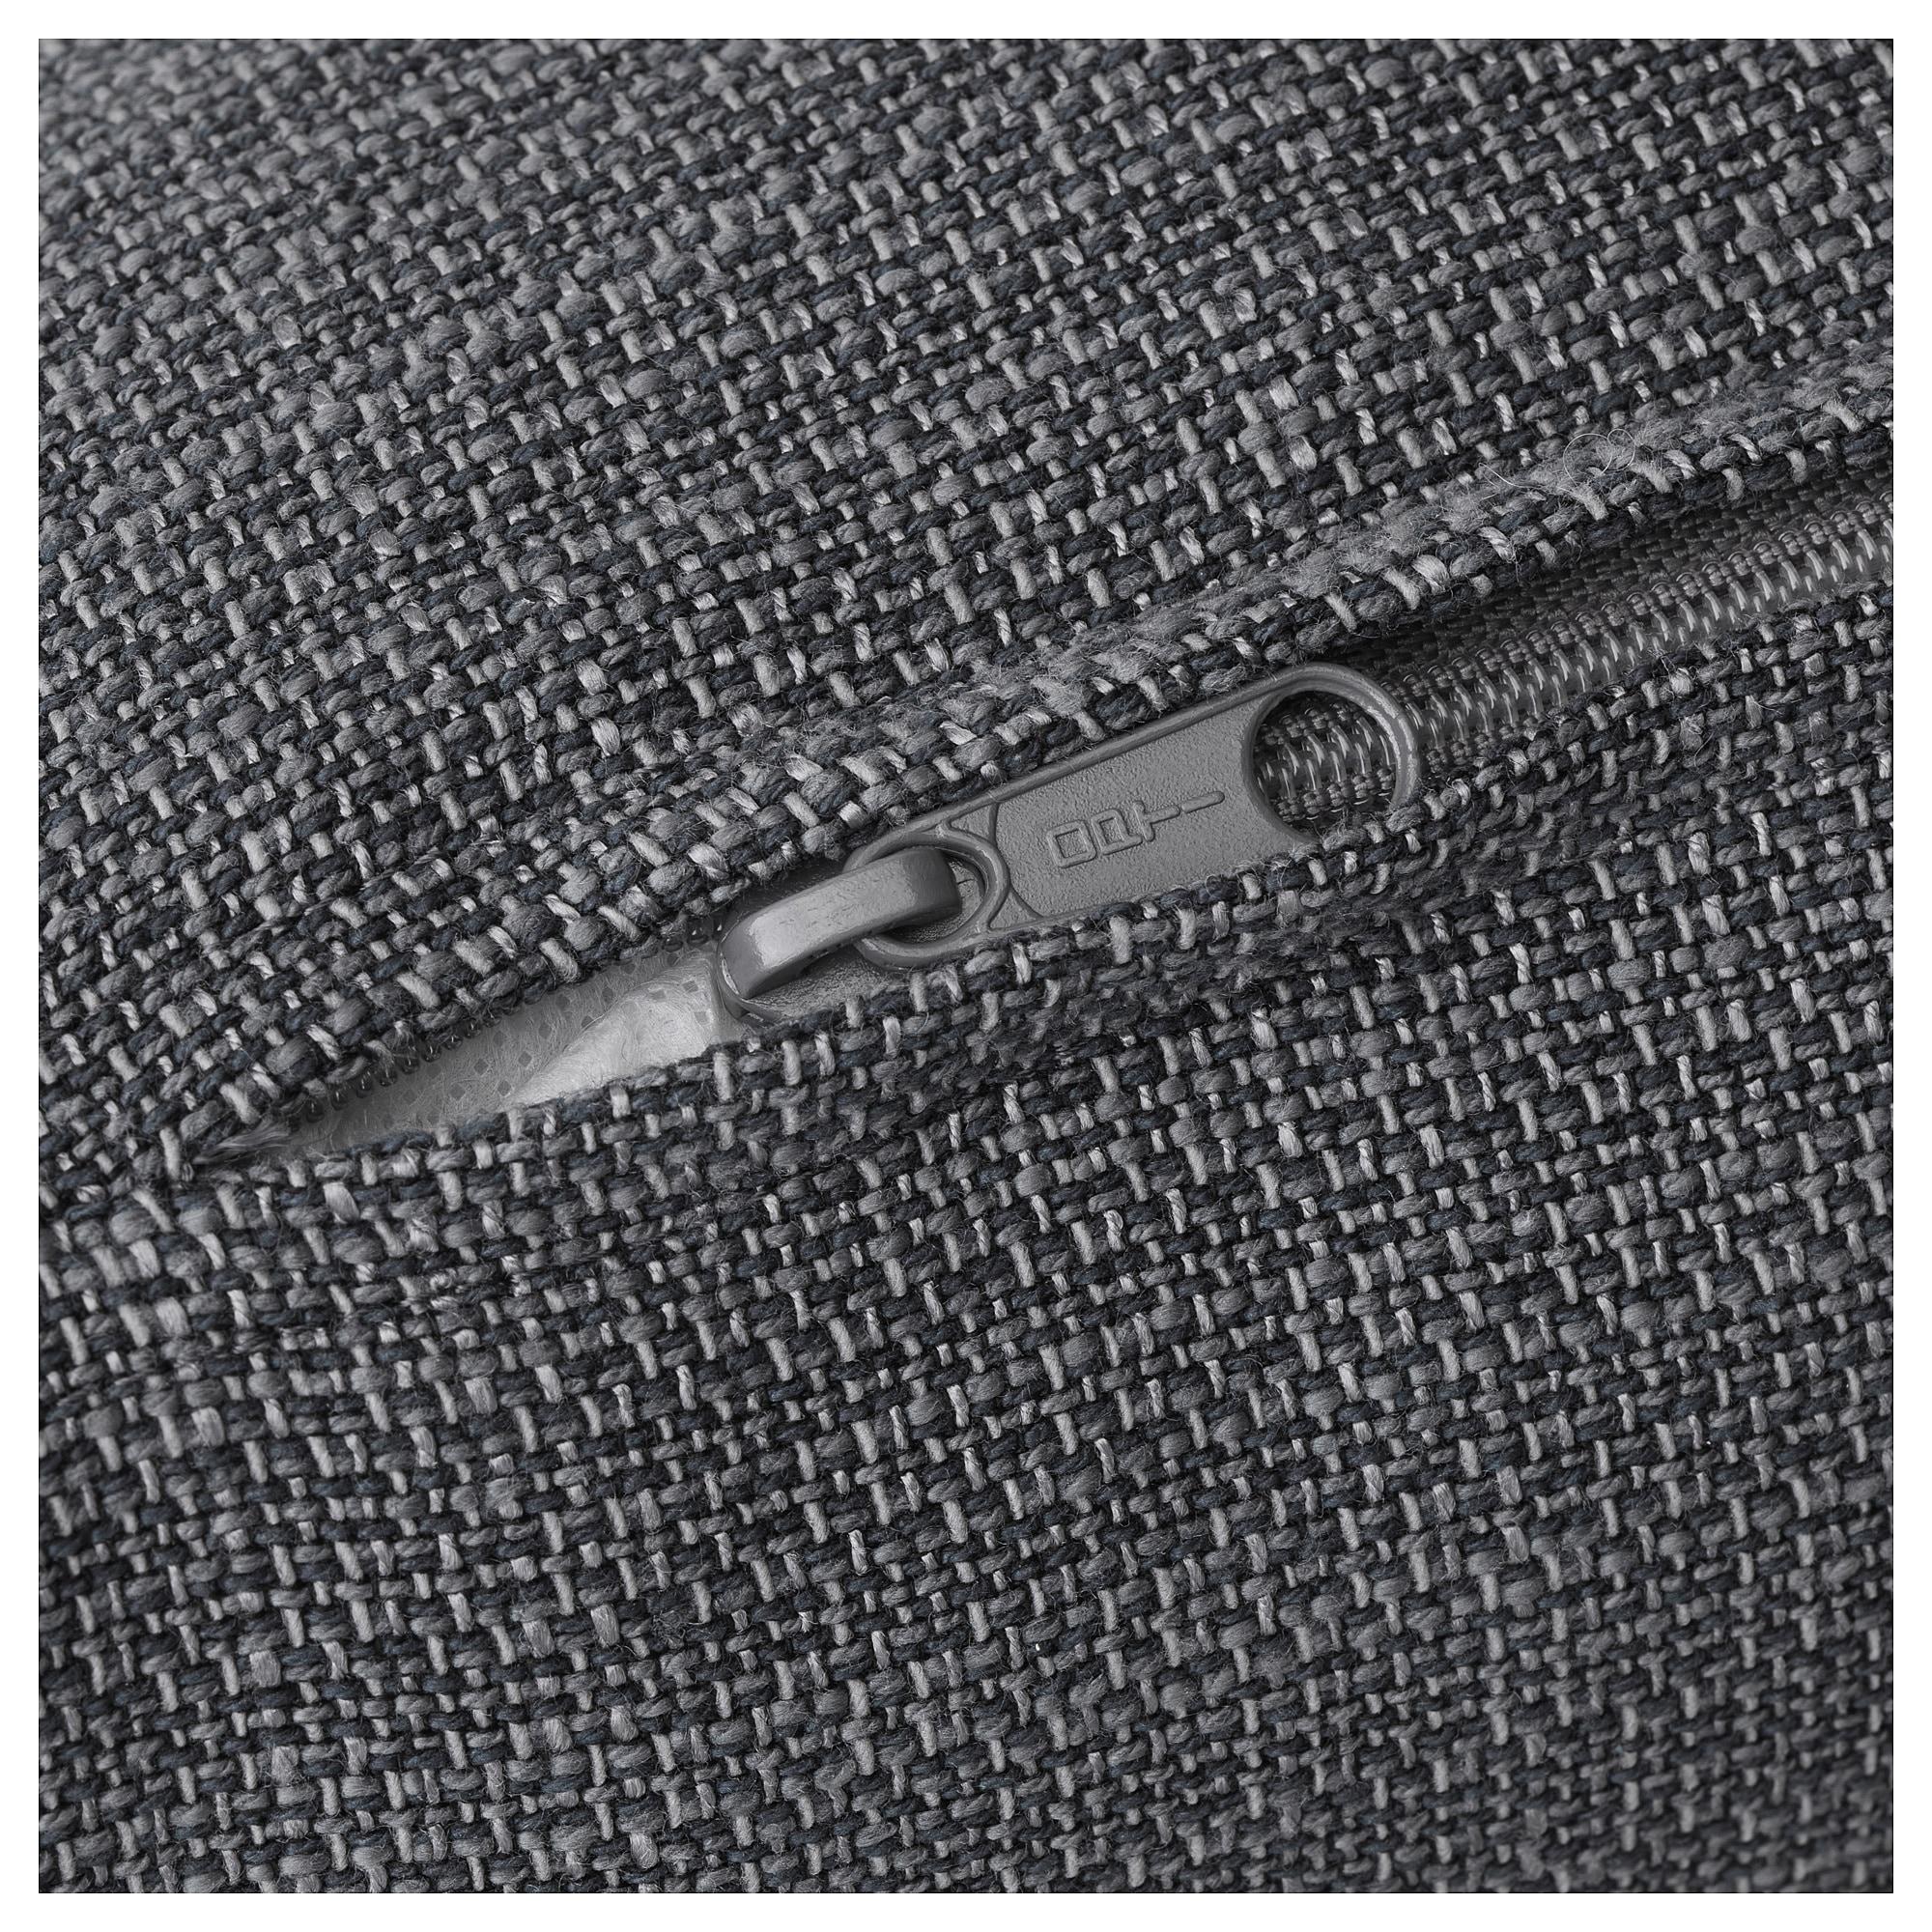 Подушка спинки ВАЛЛЕНТУНА темно-серый артикуль № 192.825.04 в наличии. Онлайн магазин IKEA РБ. Быстрая доставка и установка.